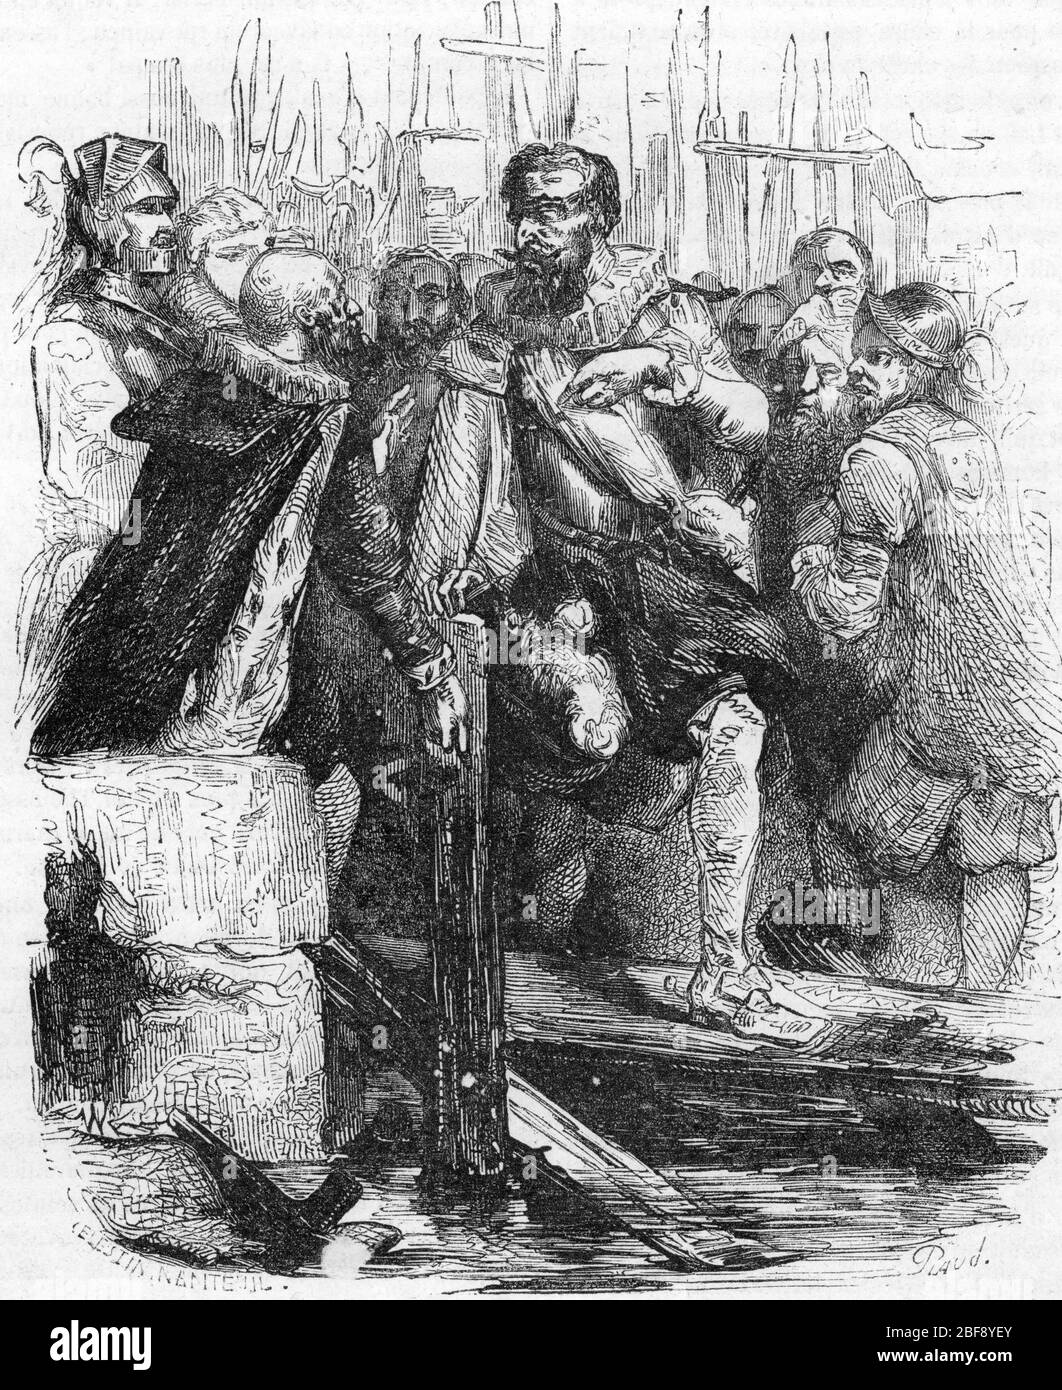 'Le roi Henri IV franchissant le pont neuf lors de sa construction en 1604 (re Henri IV attraversa il Pont-Neuf per la prima volta 1604) gravure tiree Foto Stock